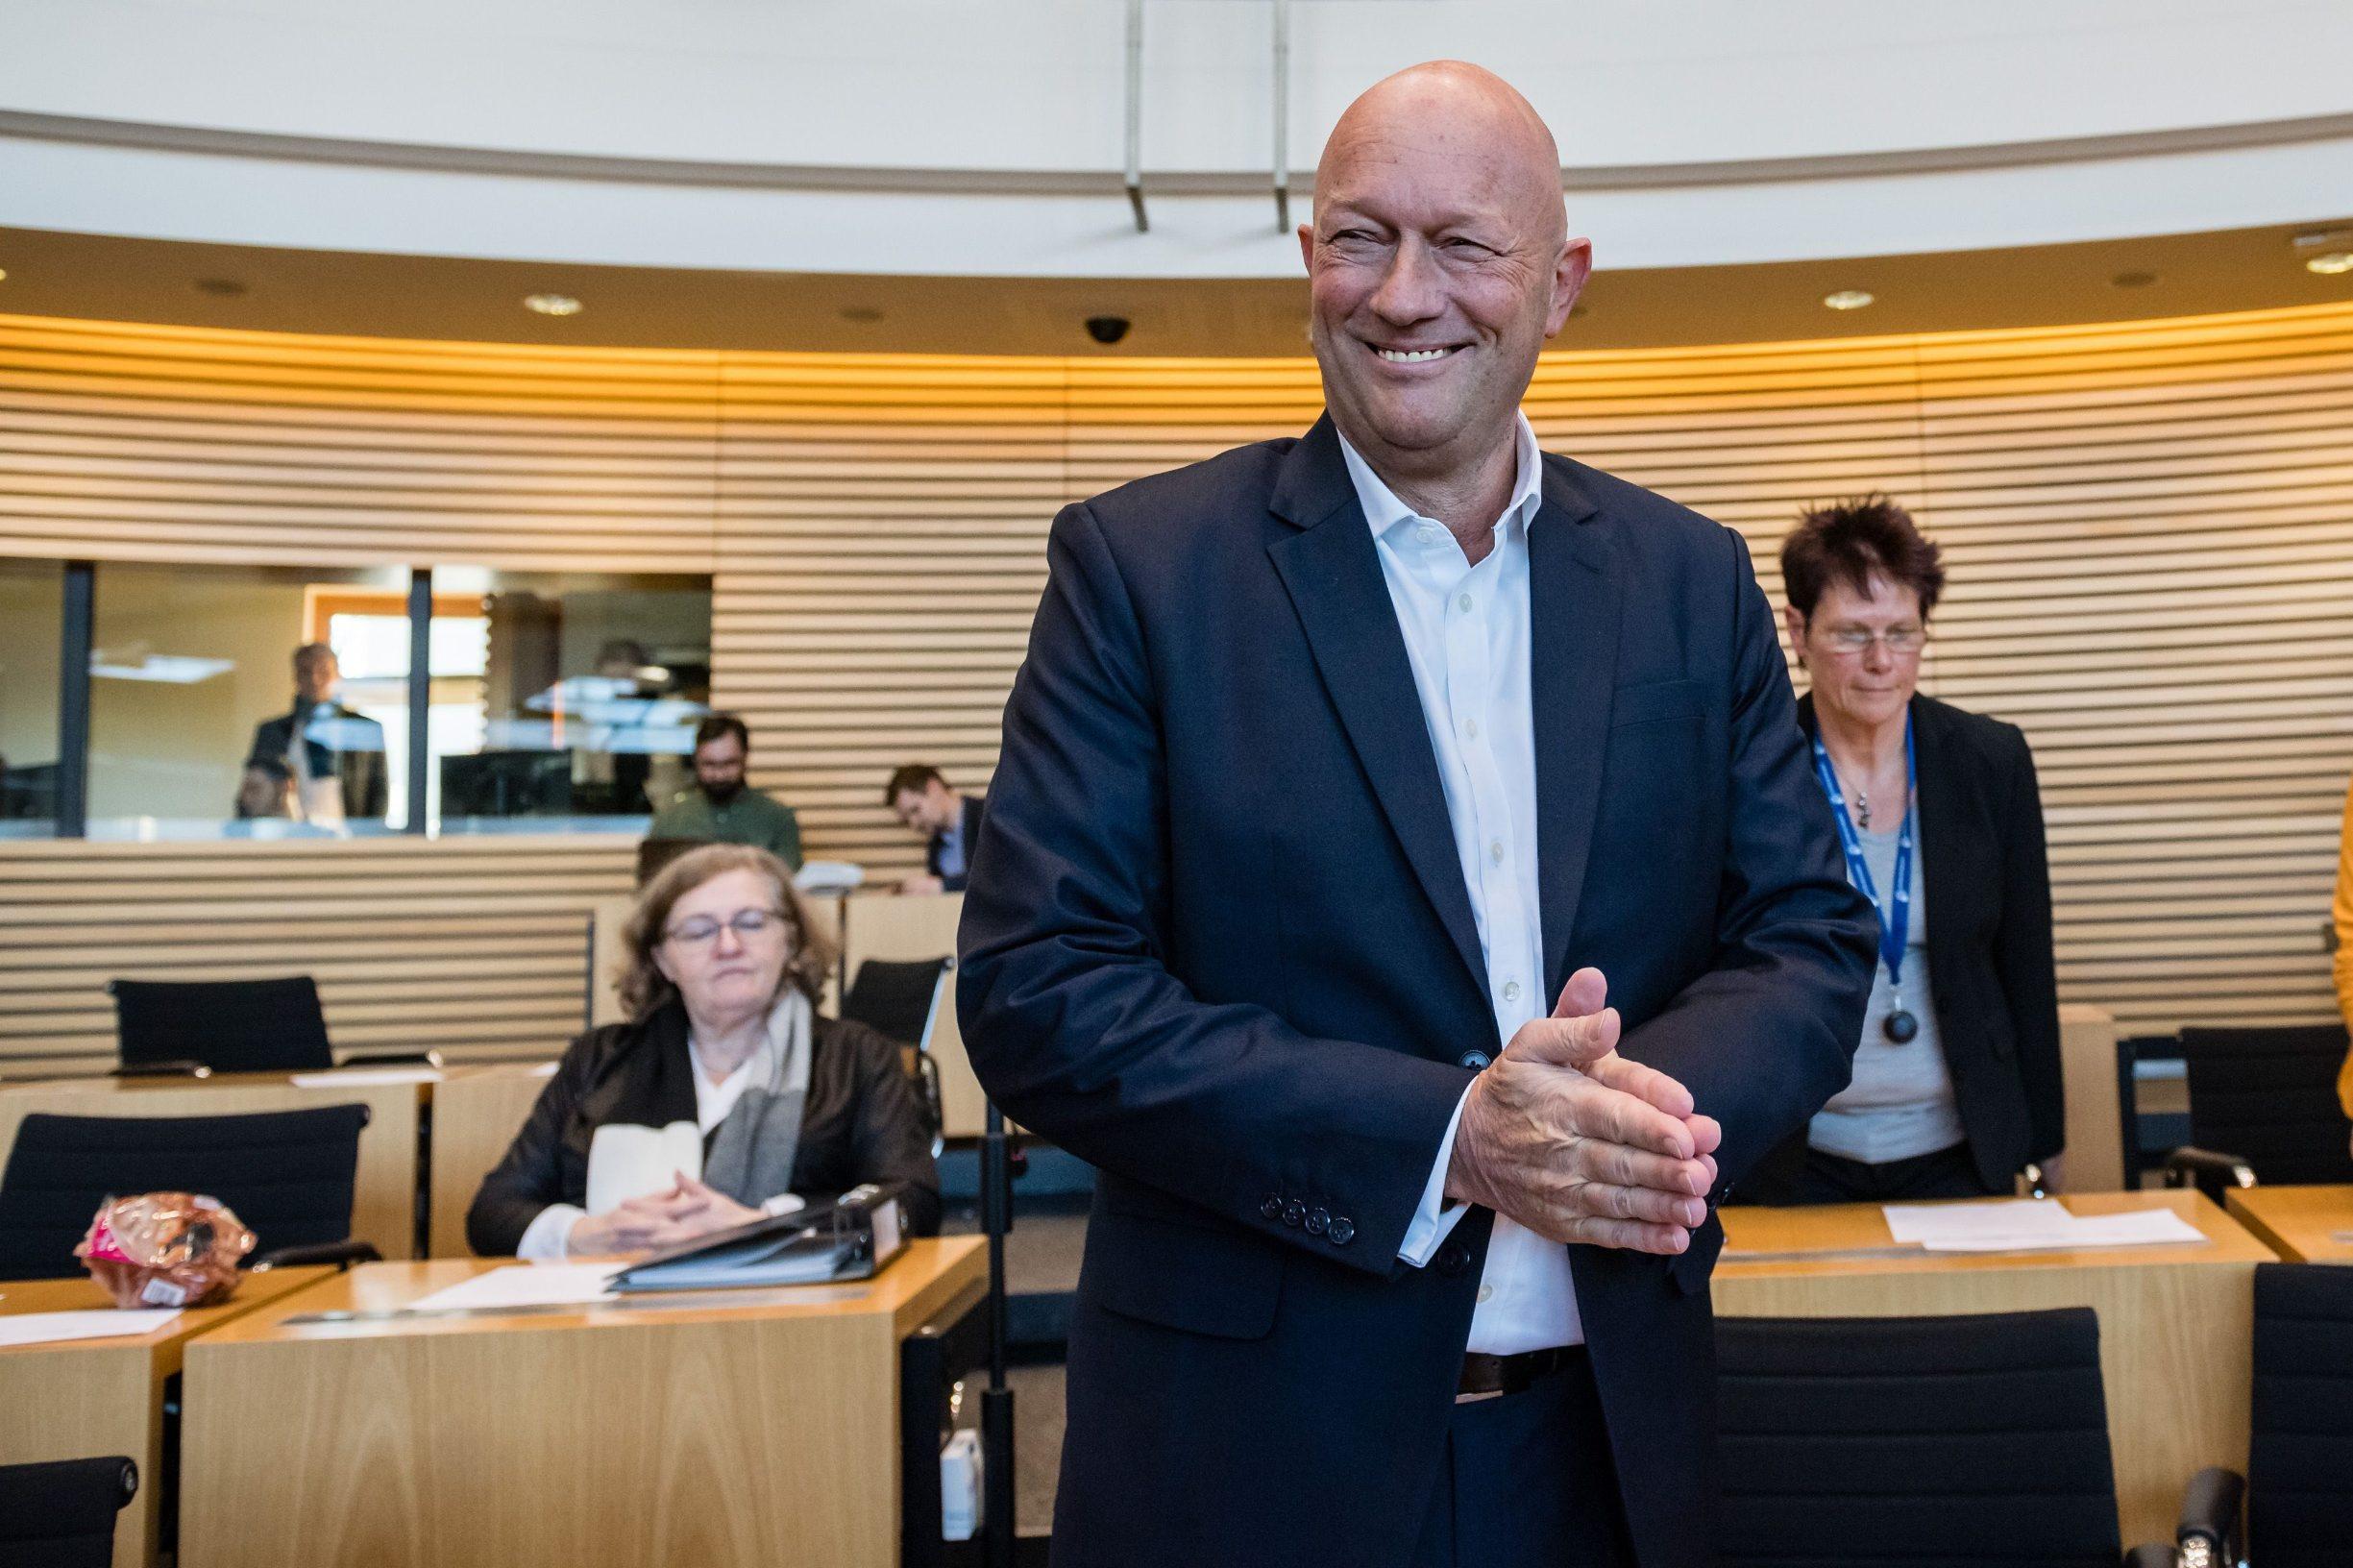 Thomas Kemmerich, novi premijer savezne države Tirinške